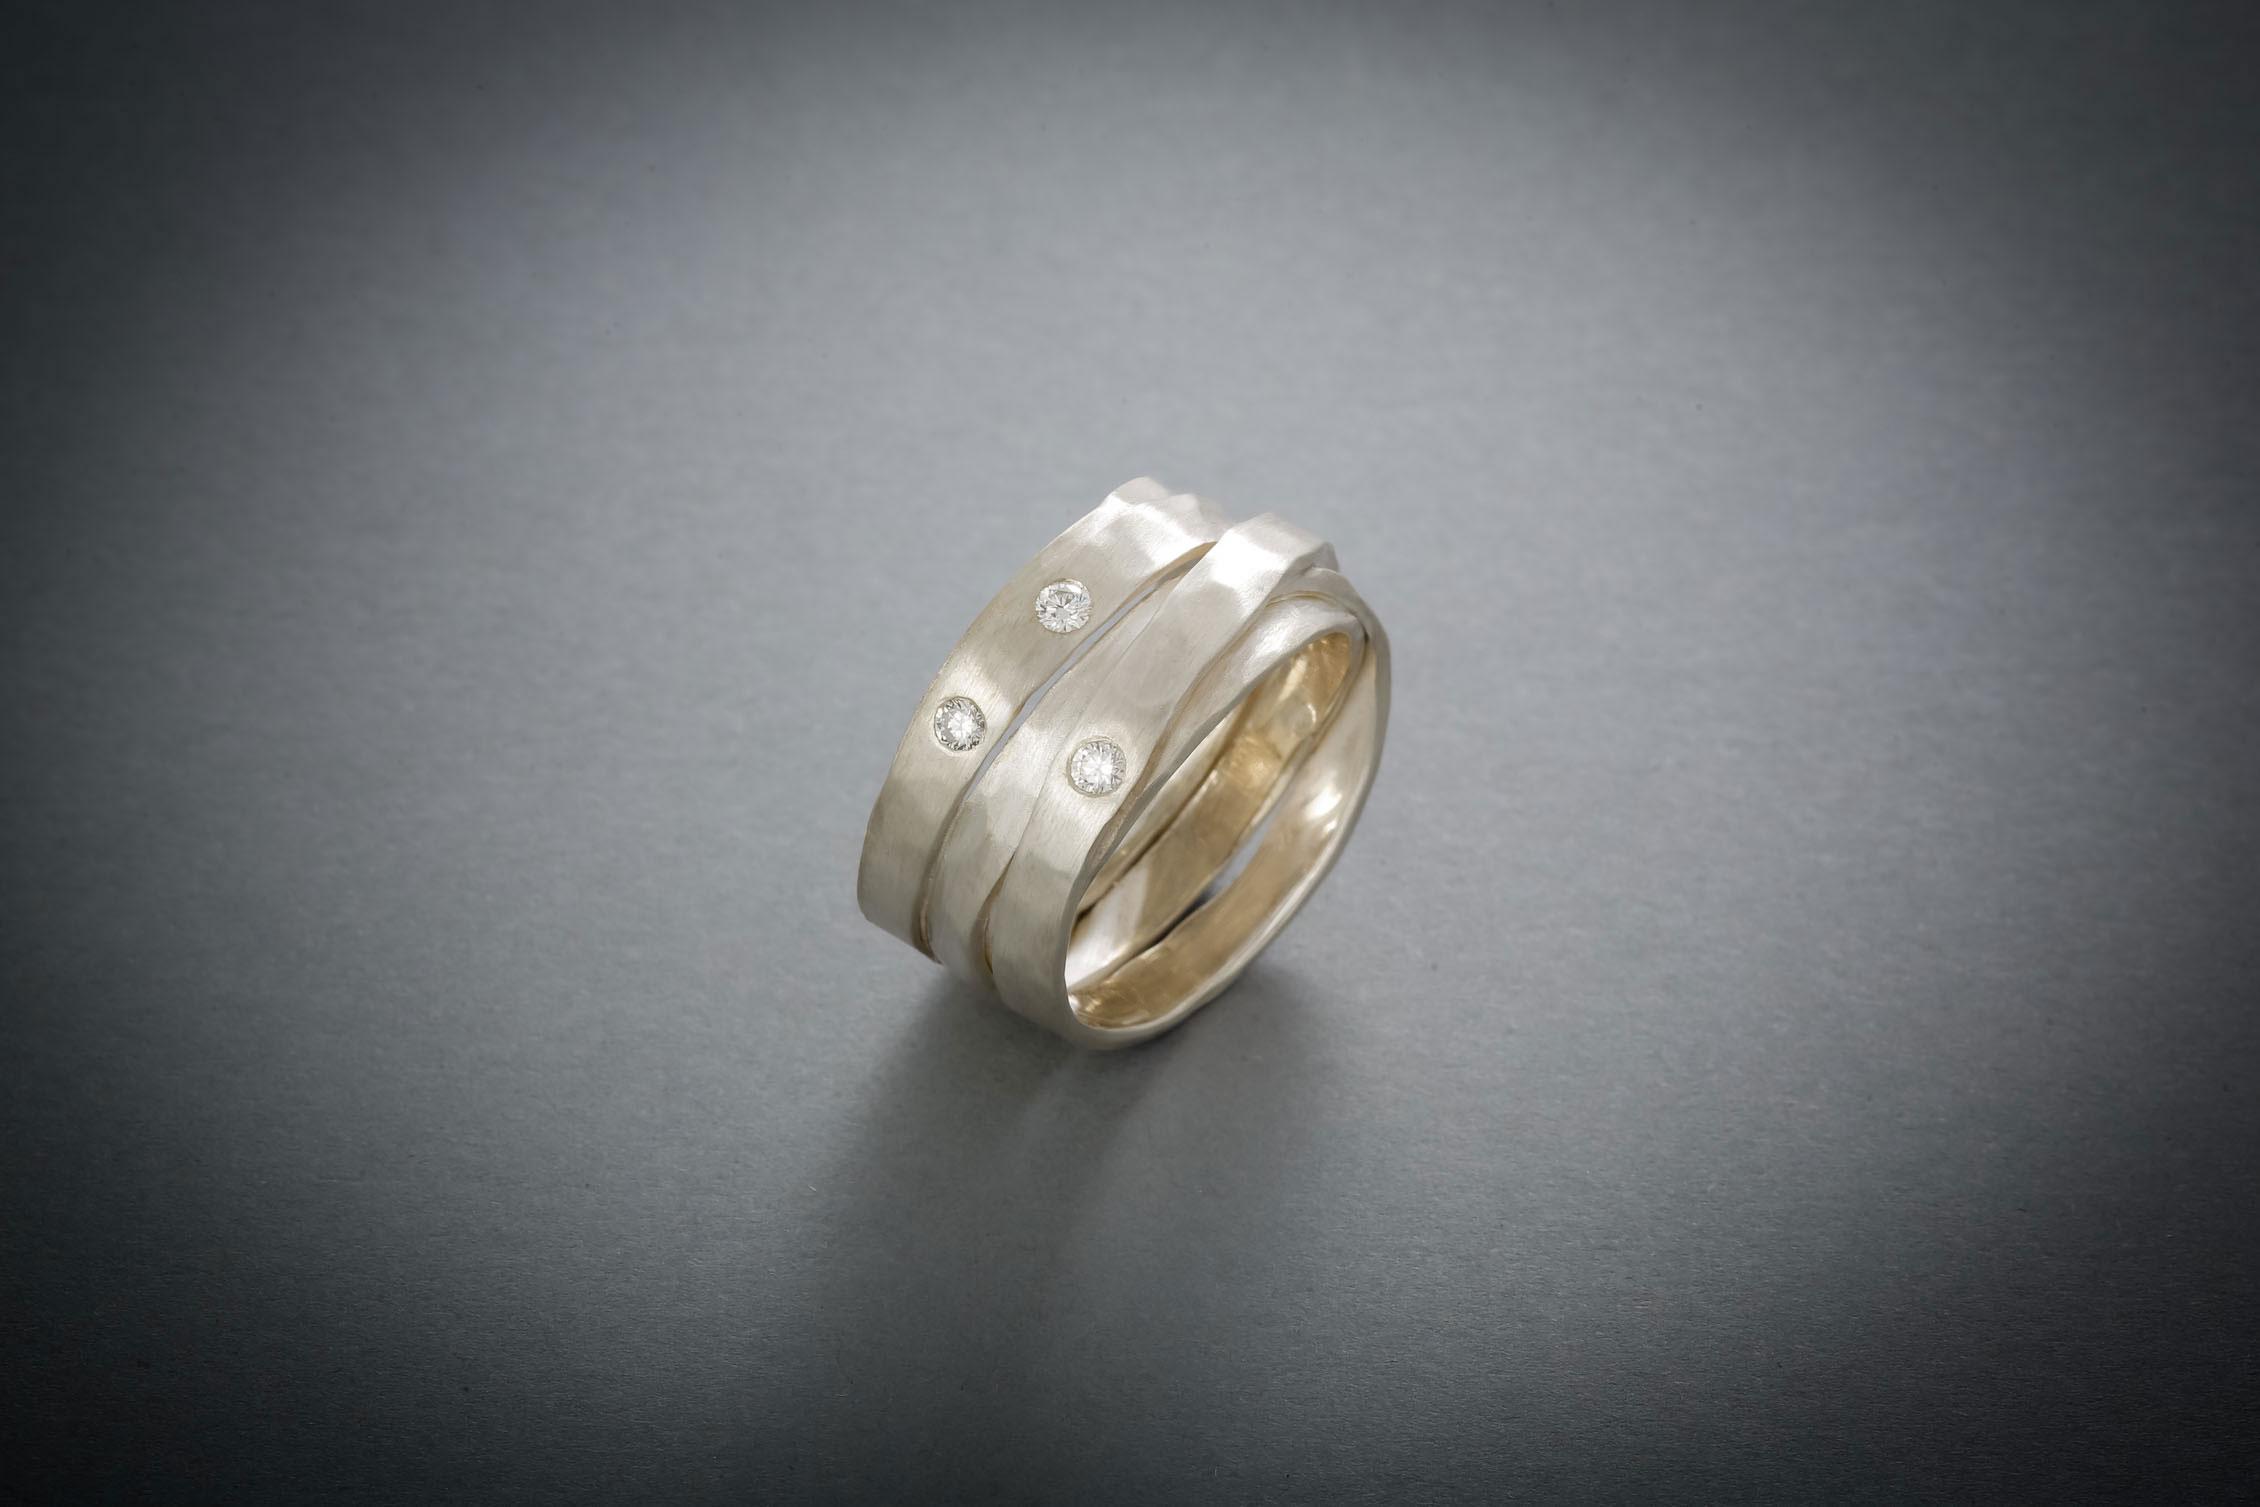 007 Wickelring, Silber, geschmiedet, 3 Brillanten, ab € 428,-